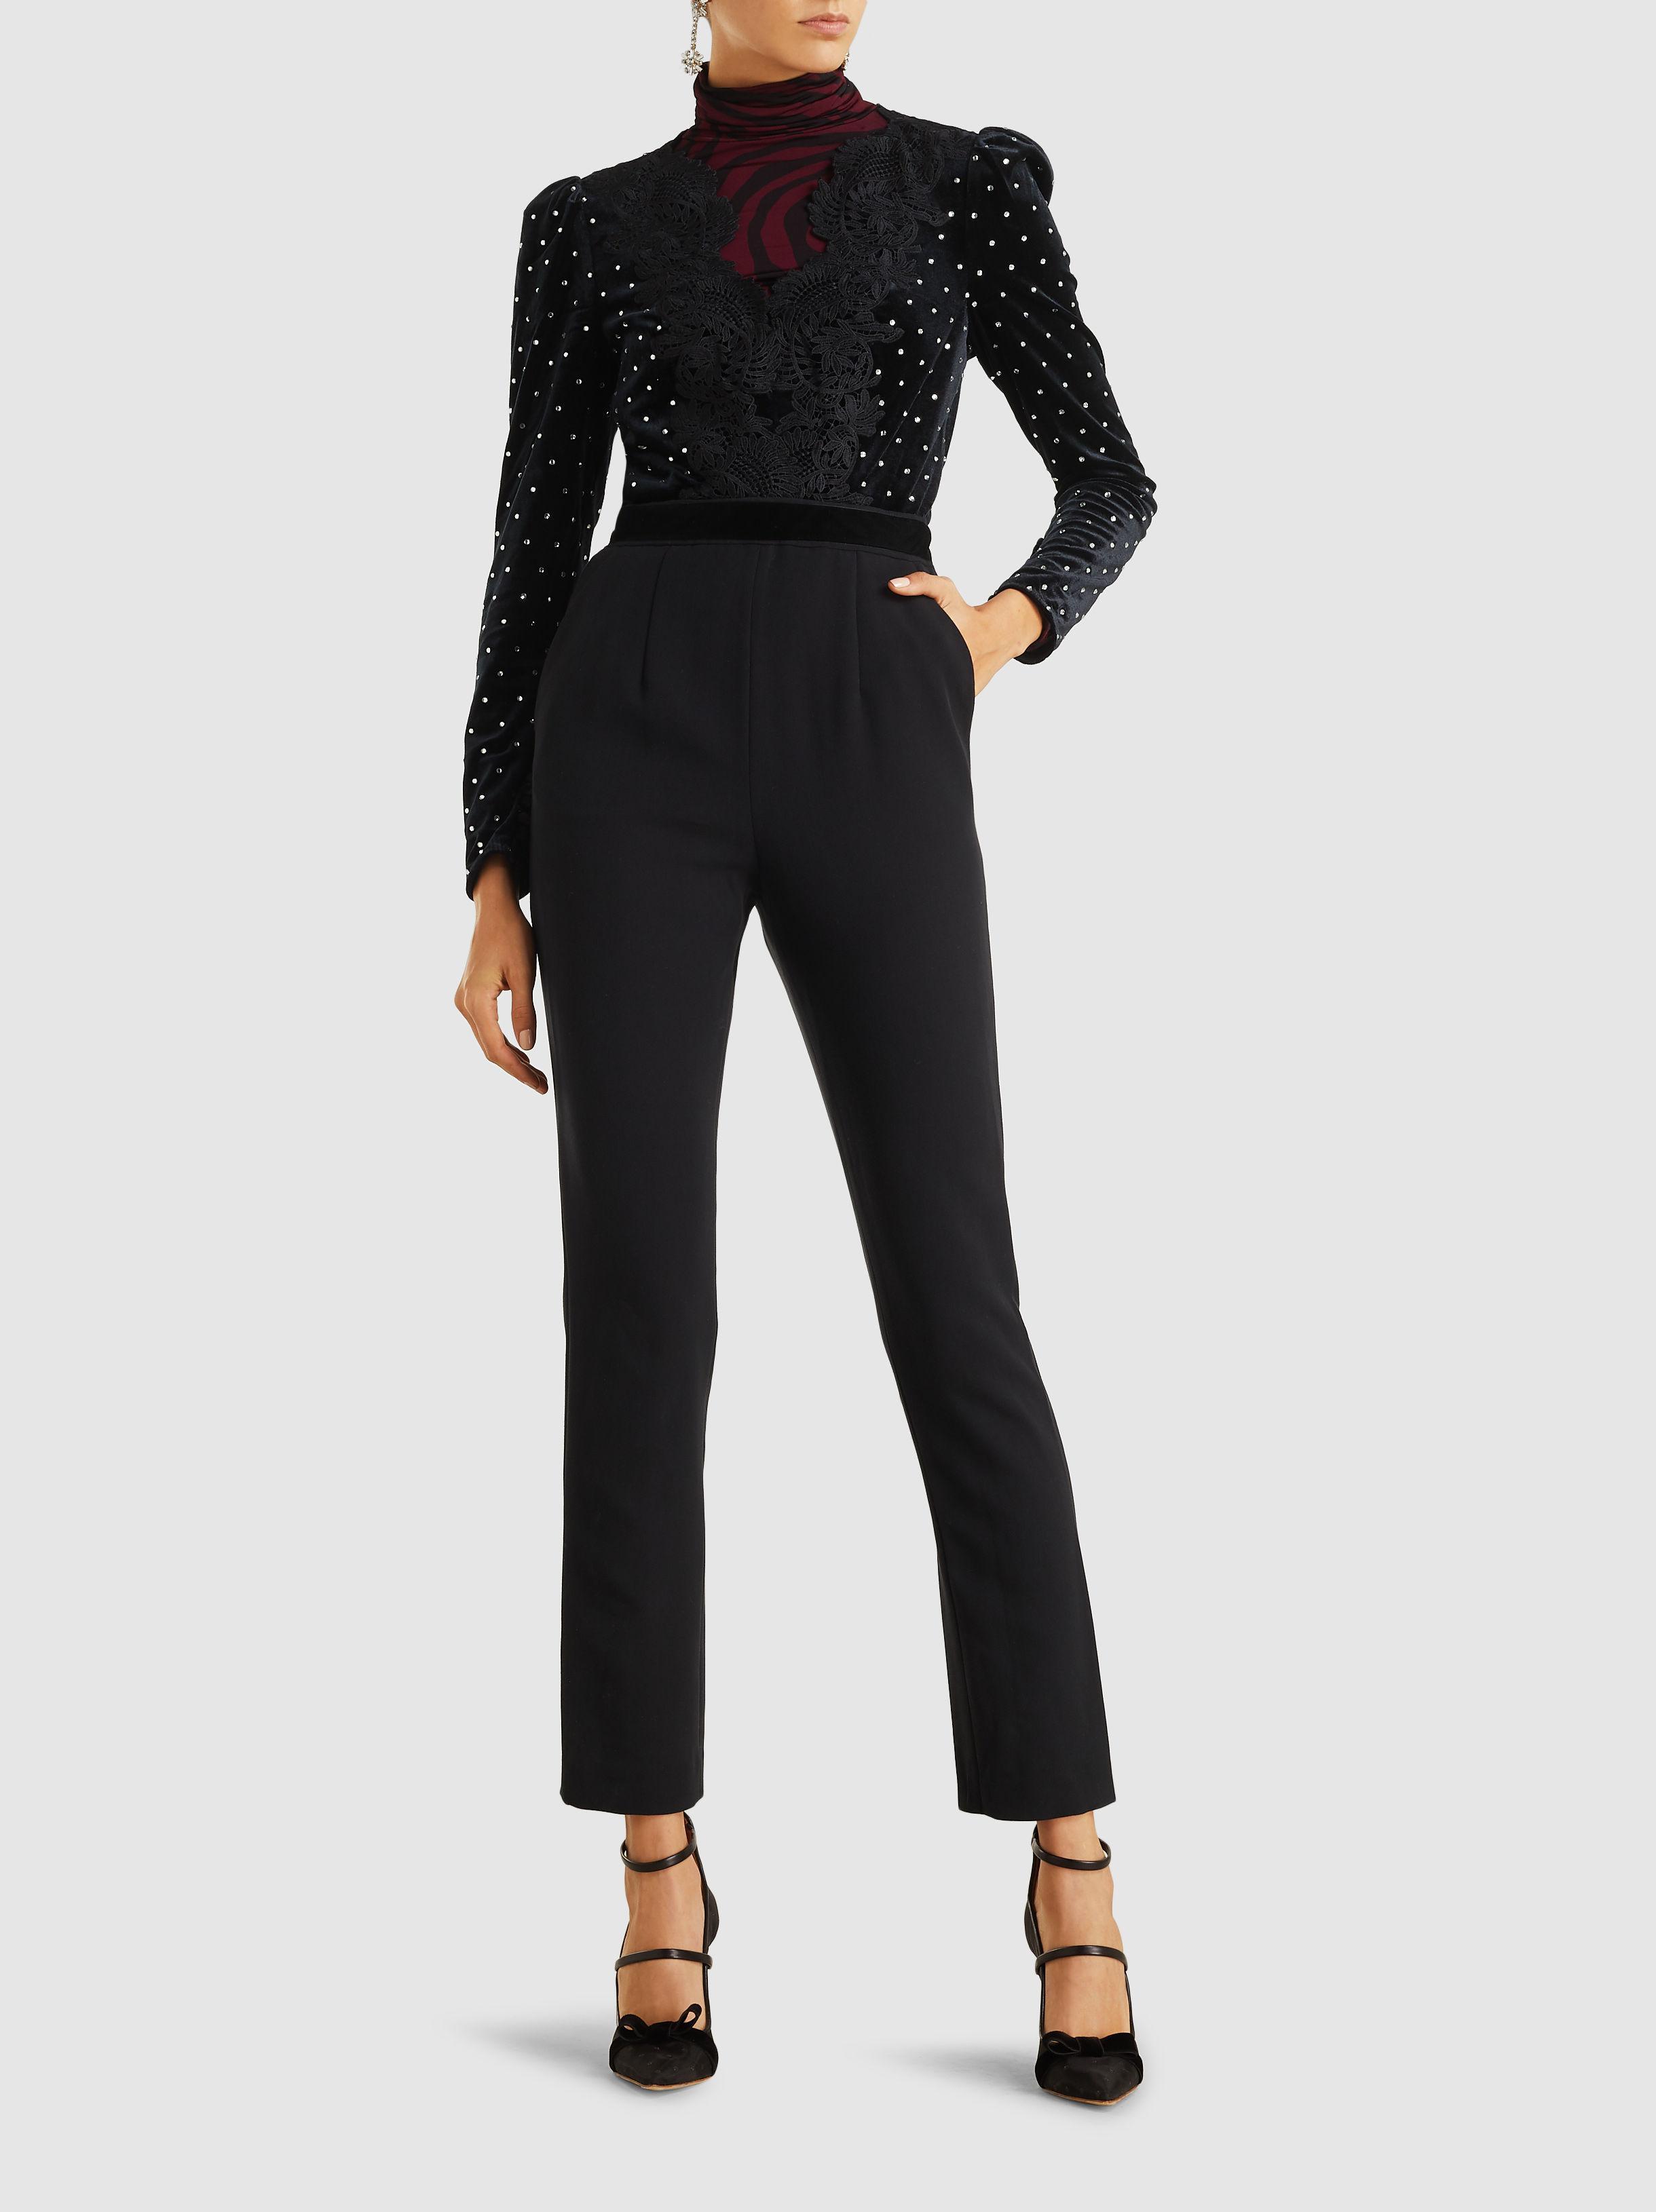 e081e35a08 Lyst - Self-Portrait Lace Trimmed Embellished Jumpsuit in Black ...